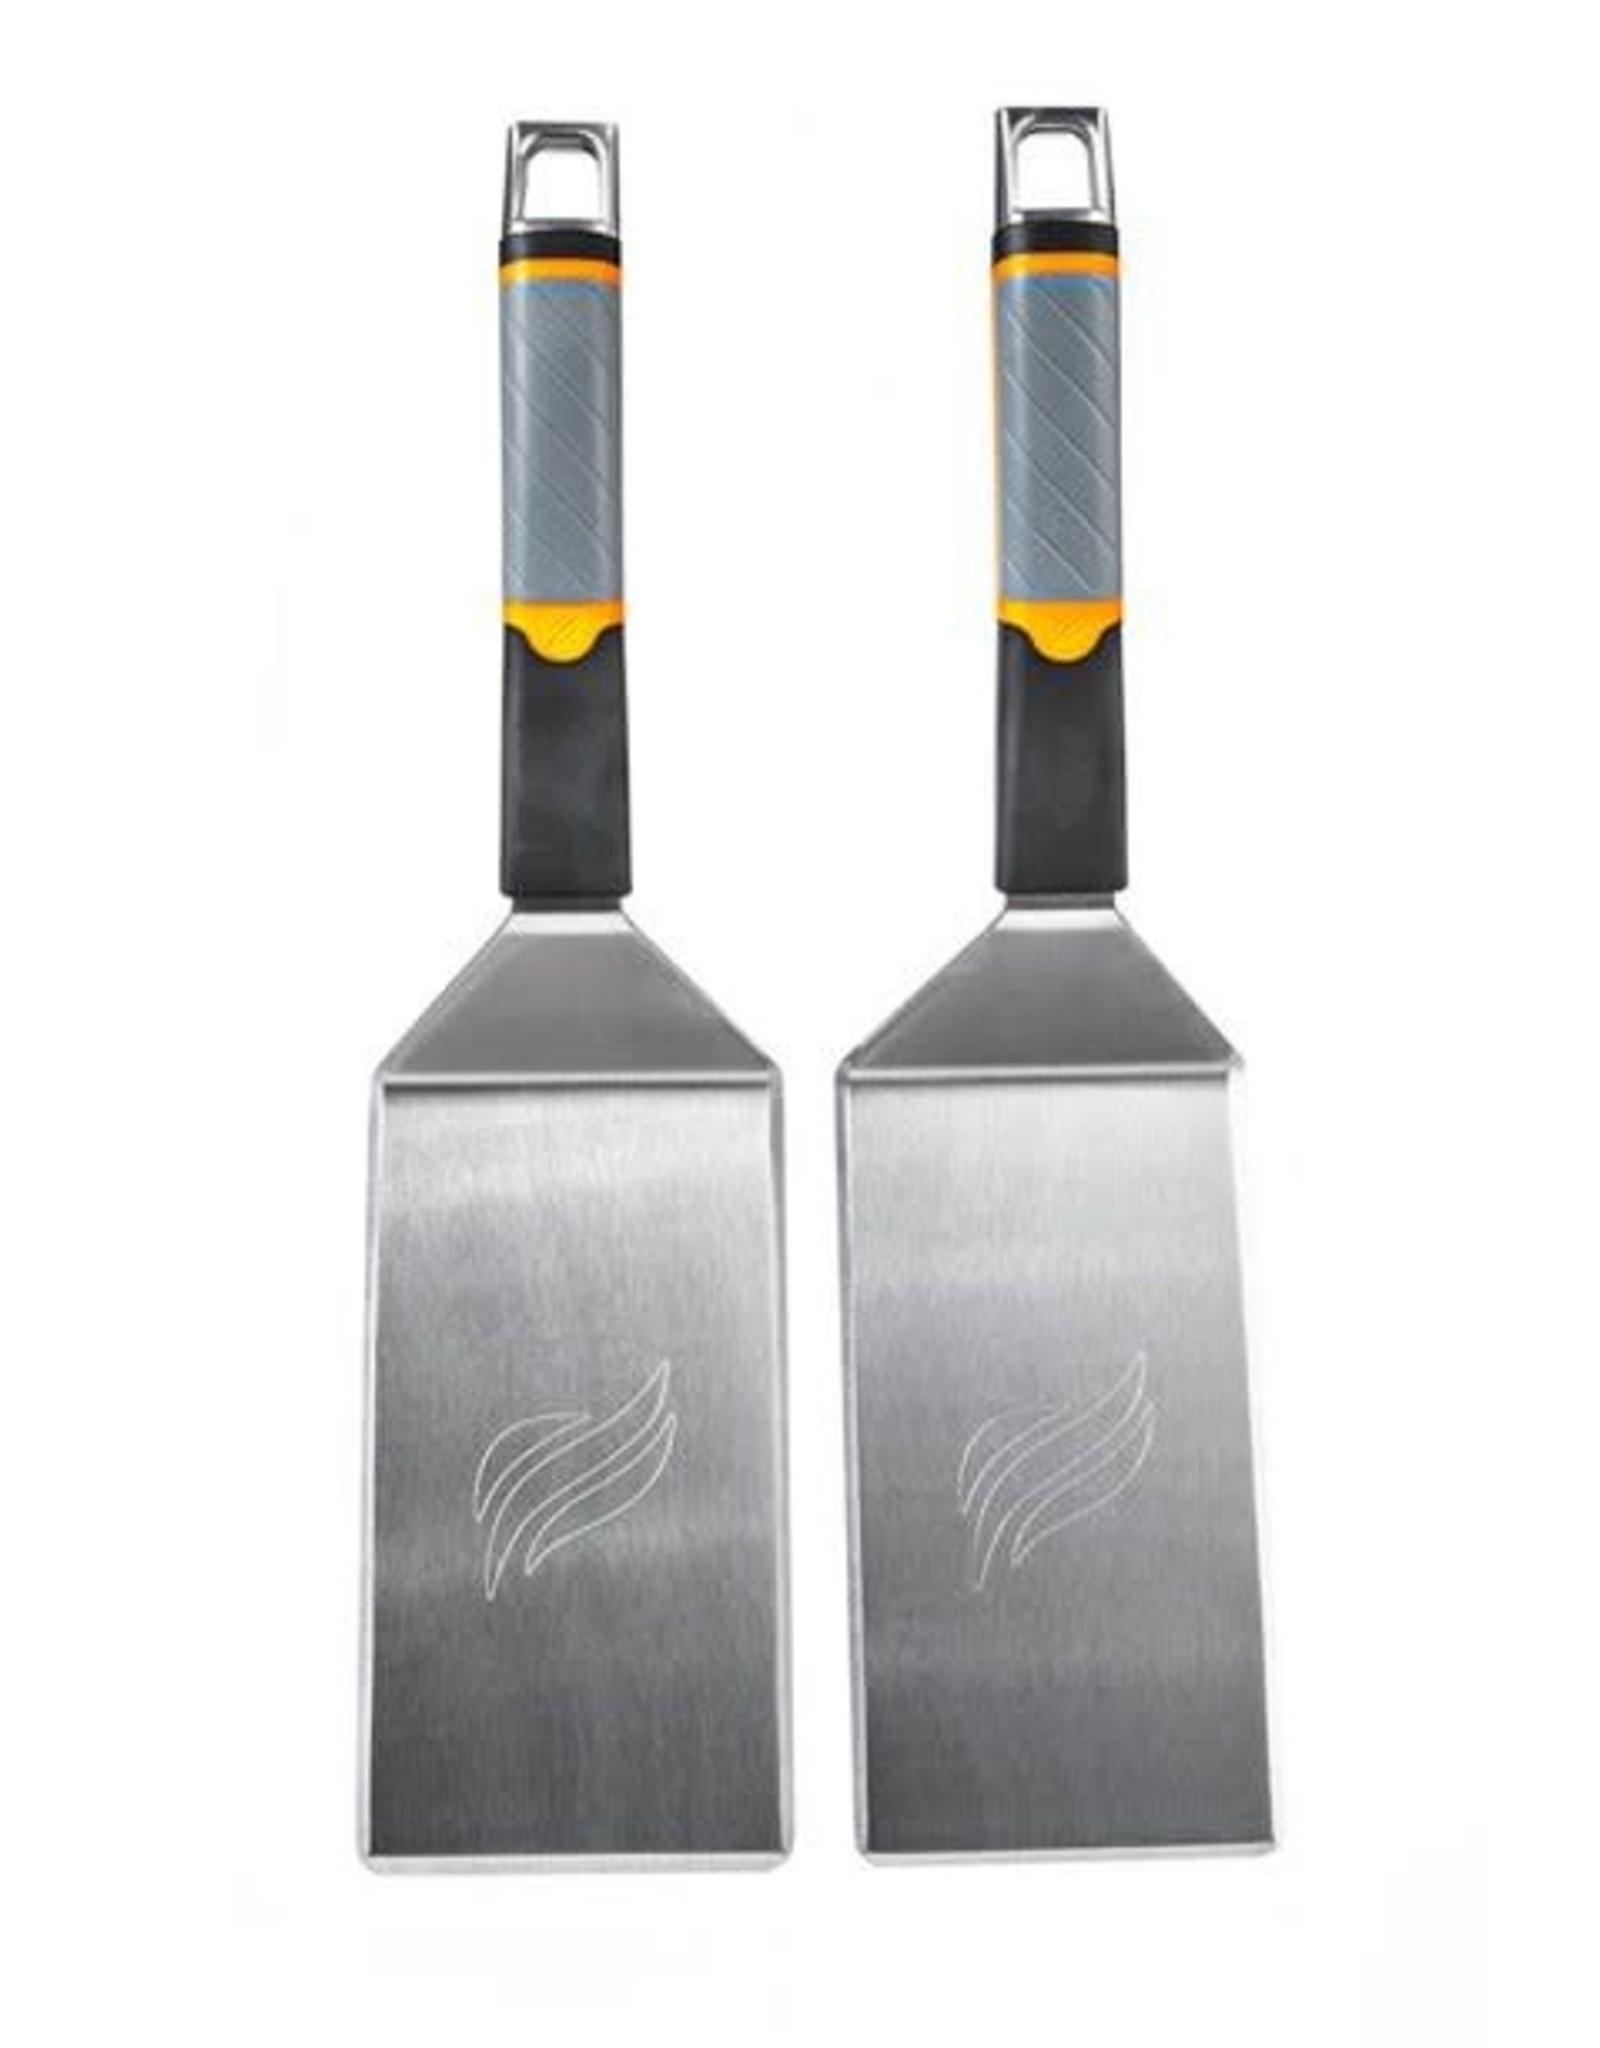 Blackstone Blackstone Signature Series Stainless Steel Griddle Spatula, 2-Pack - 5229